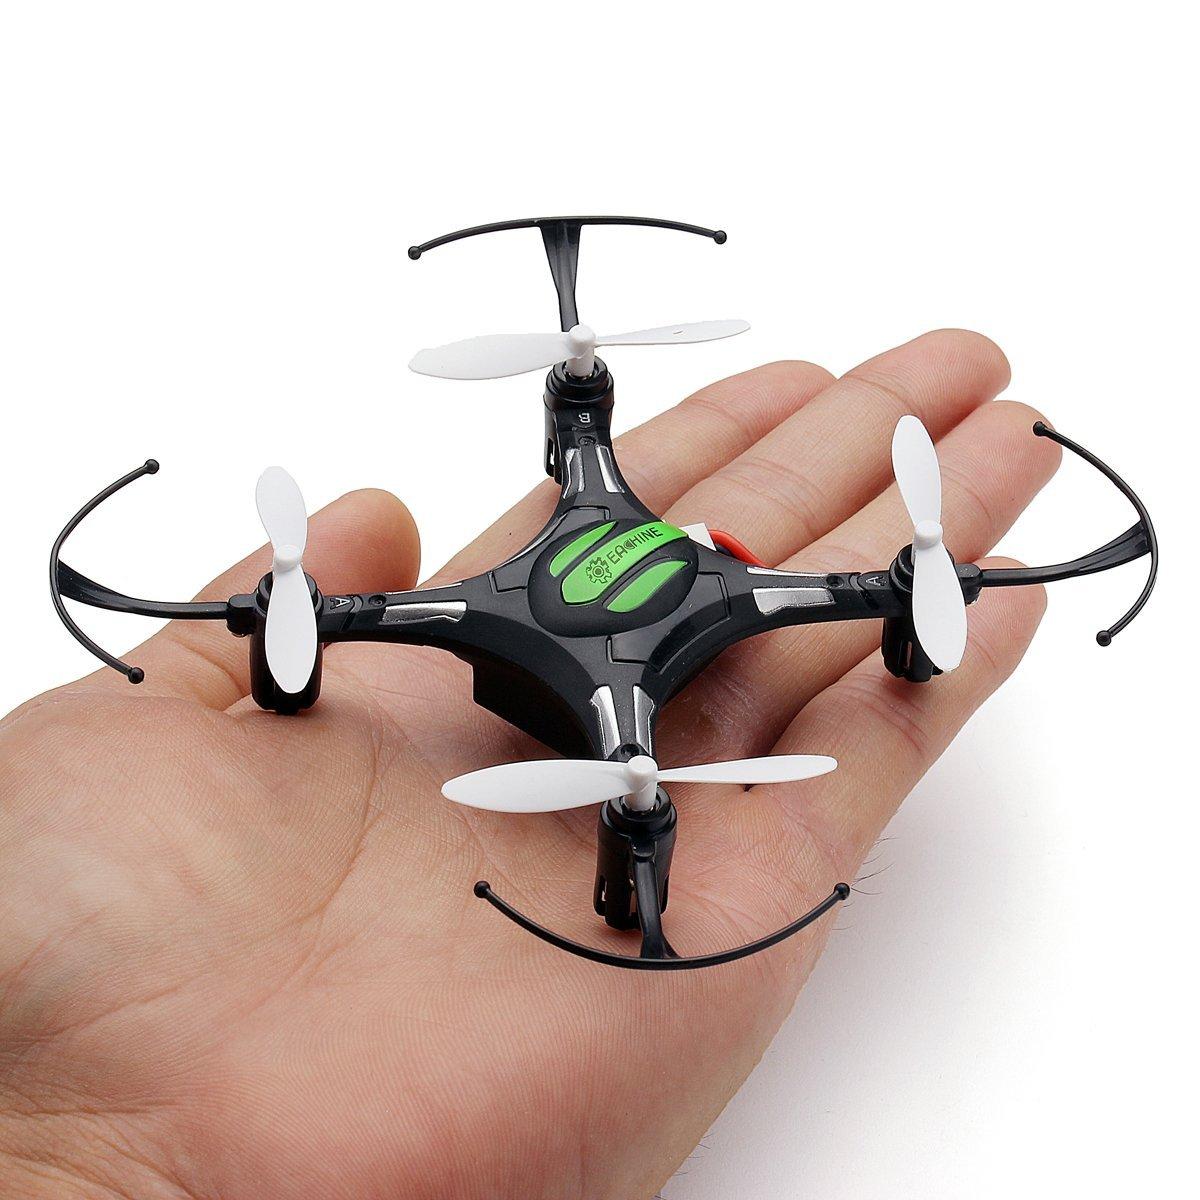 H8 Mini Headless Mode 2.4G 4CH Nano Quadcopter Drone